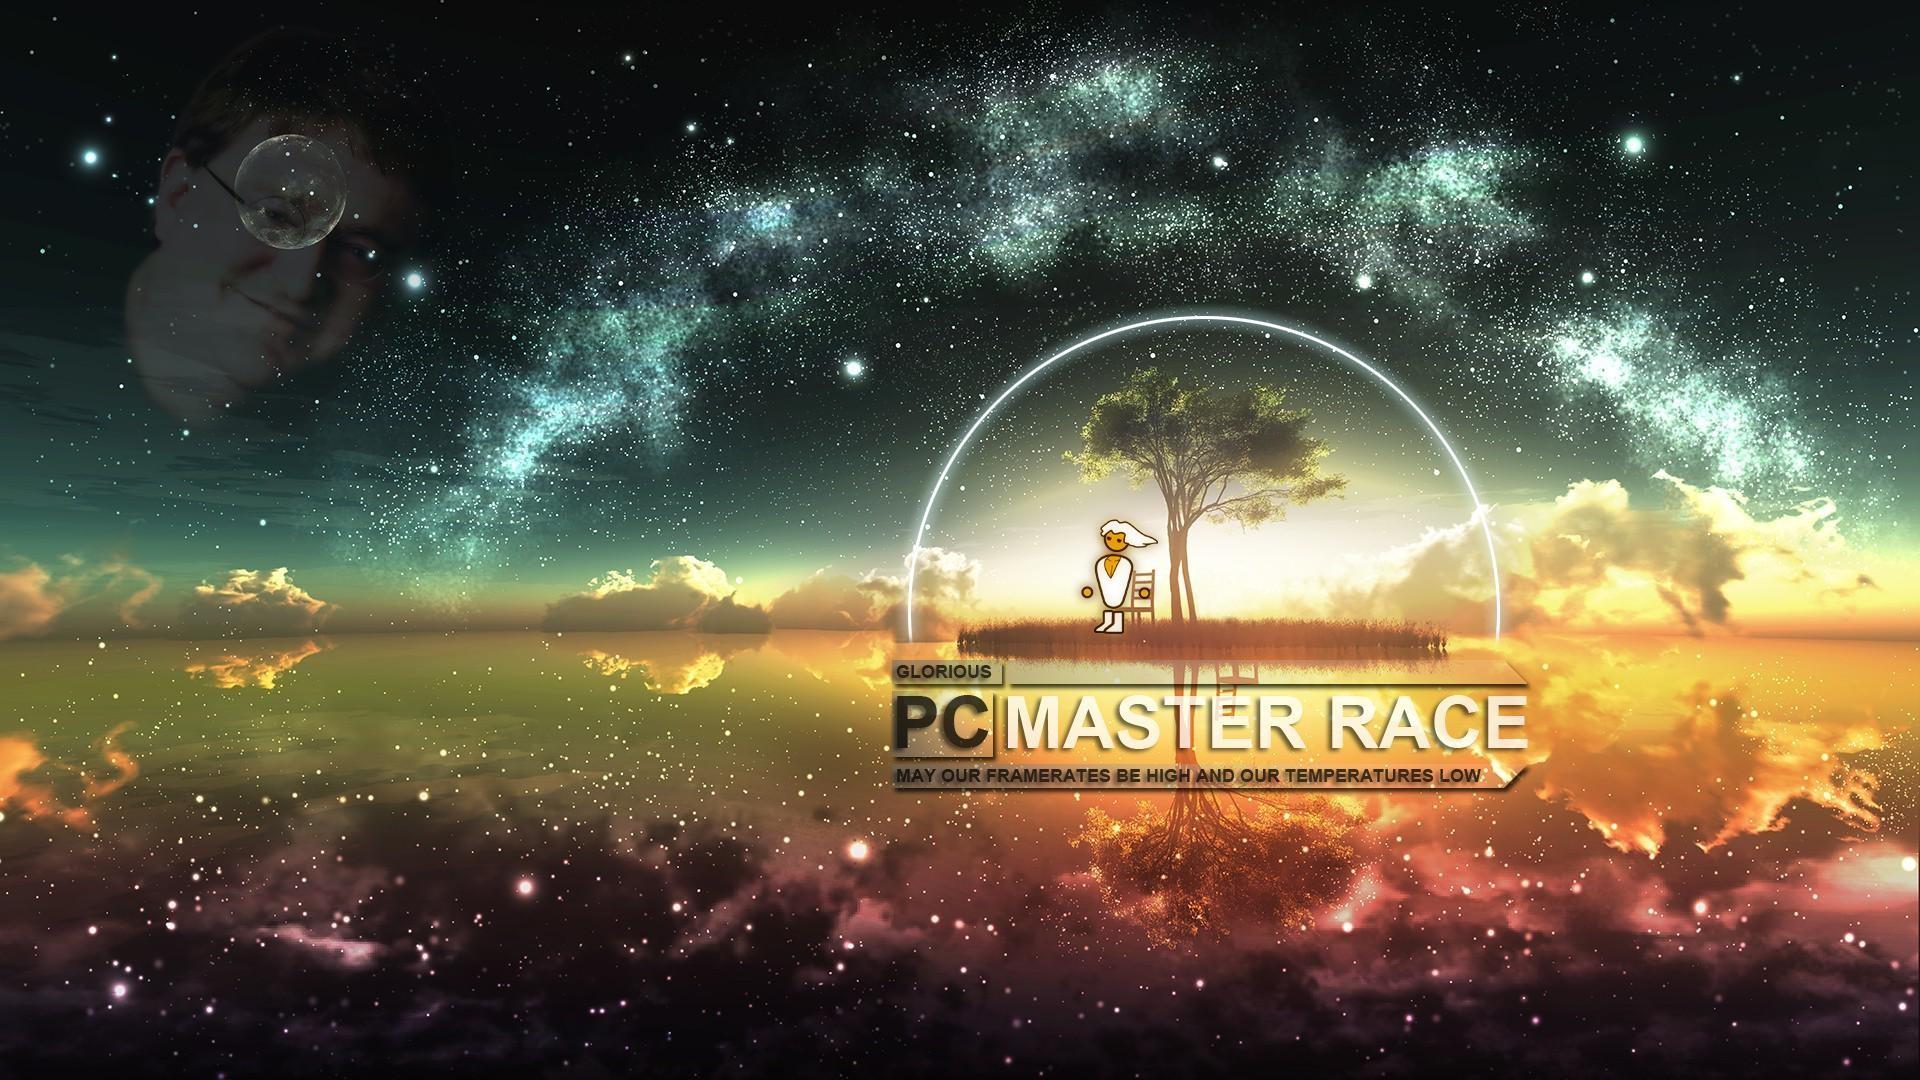 PCMR wallpapers in 4k+: https://imgur.com/gallery/doFgs